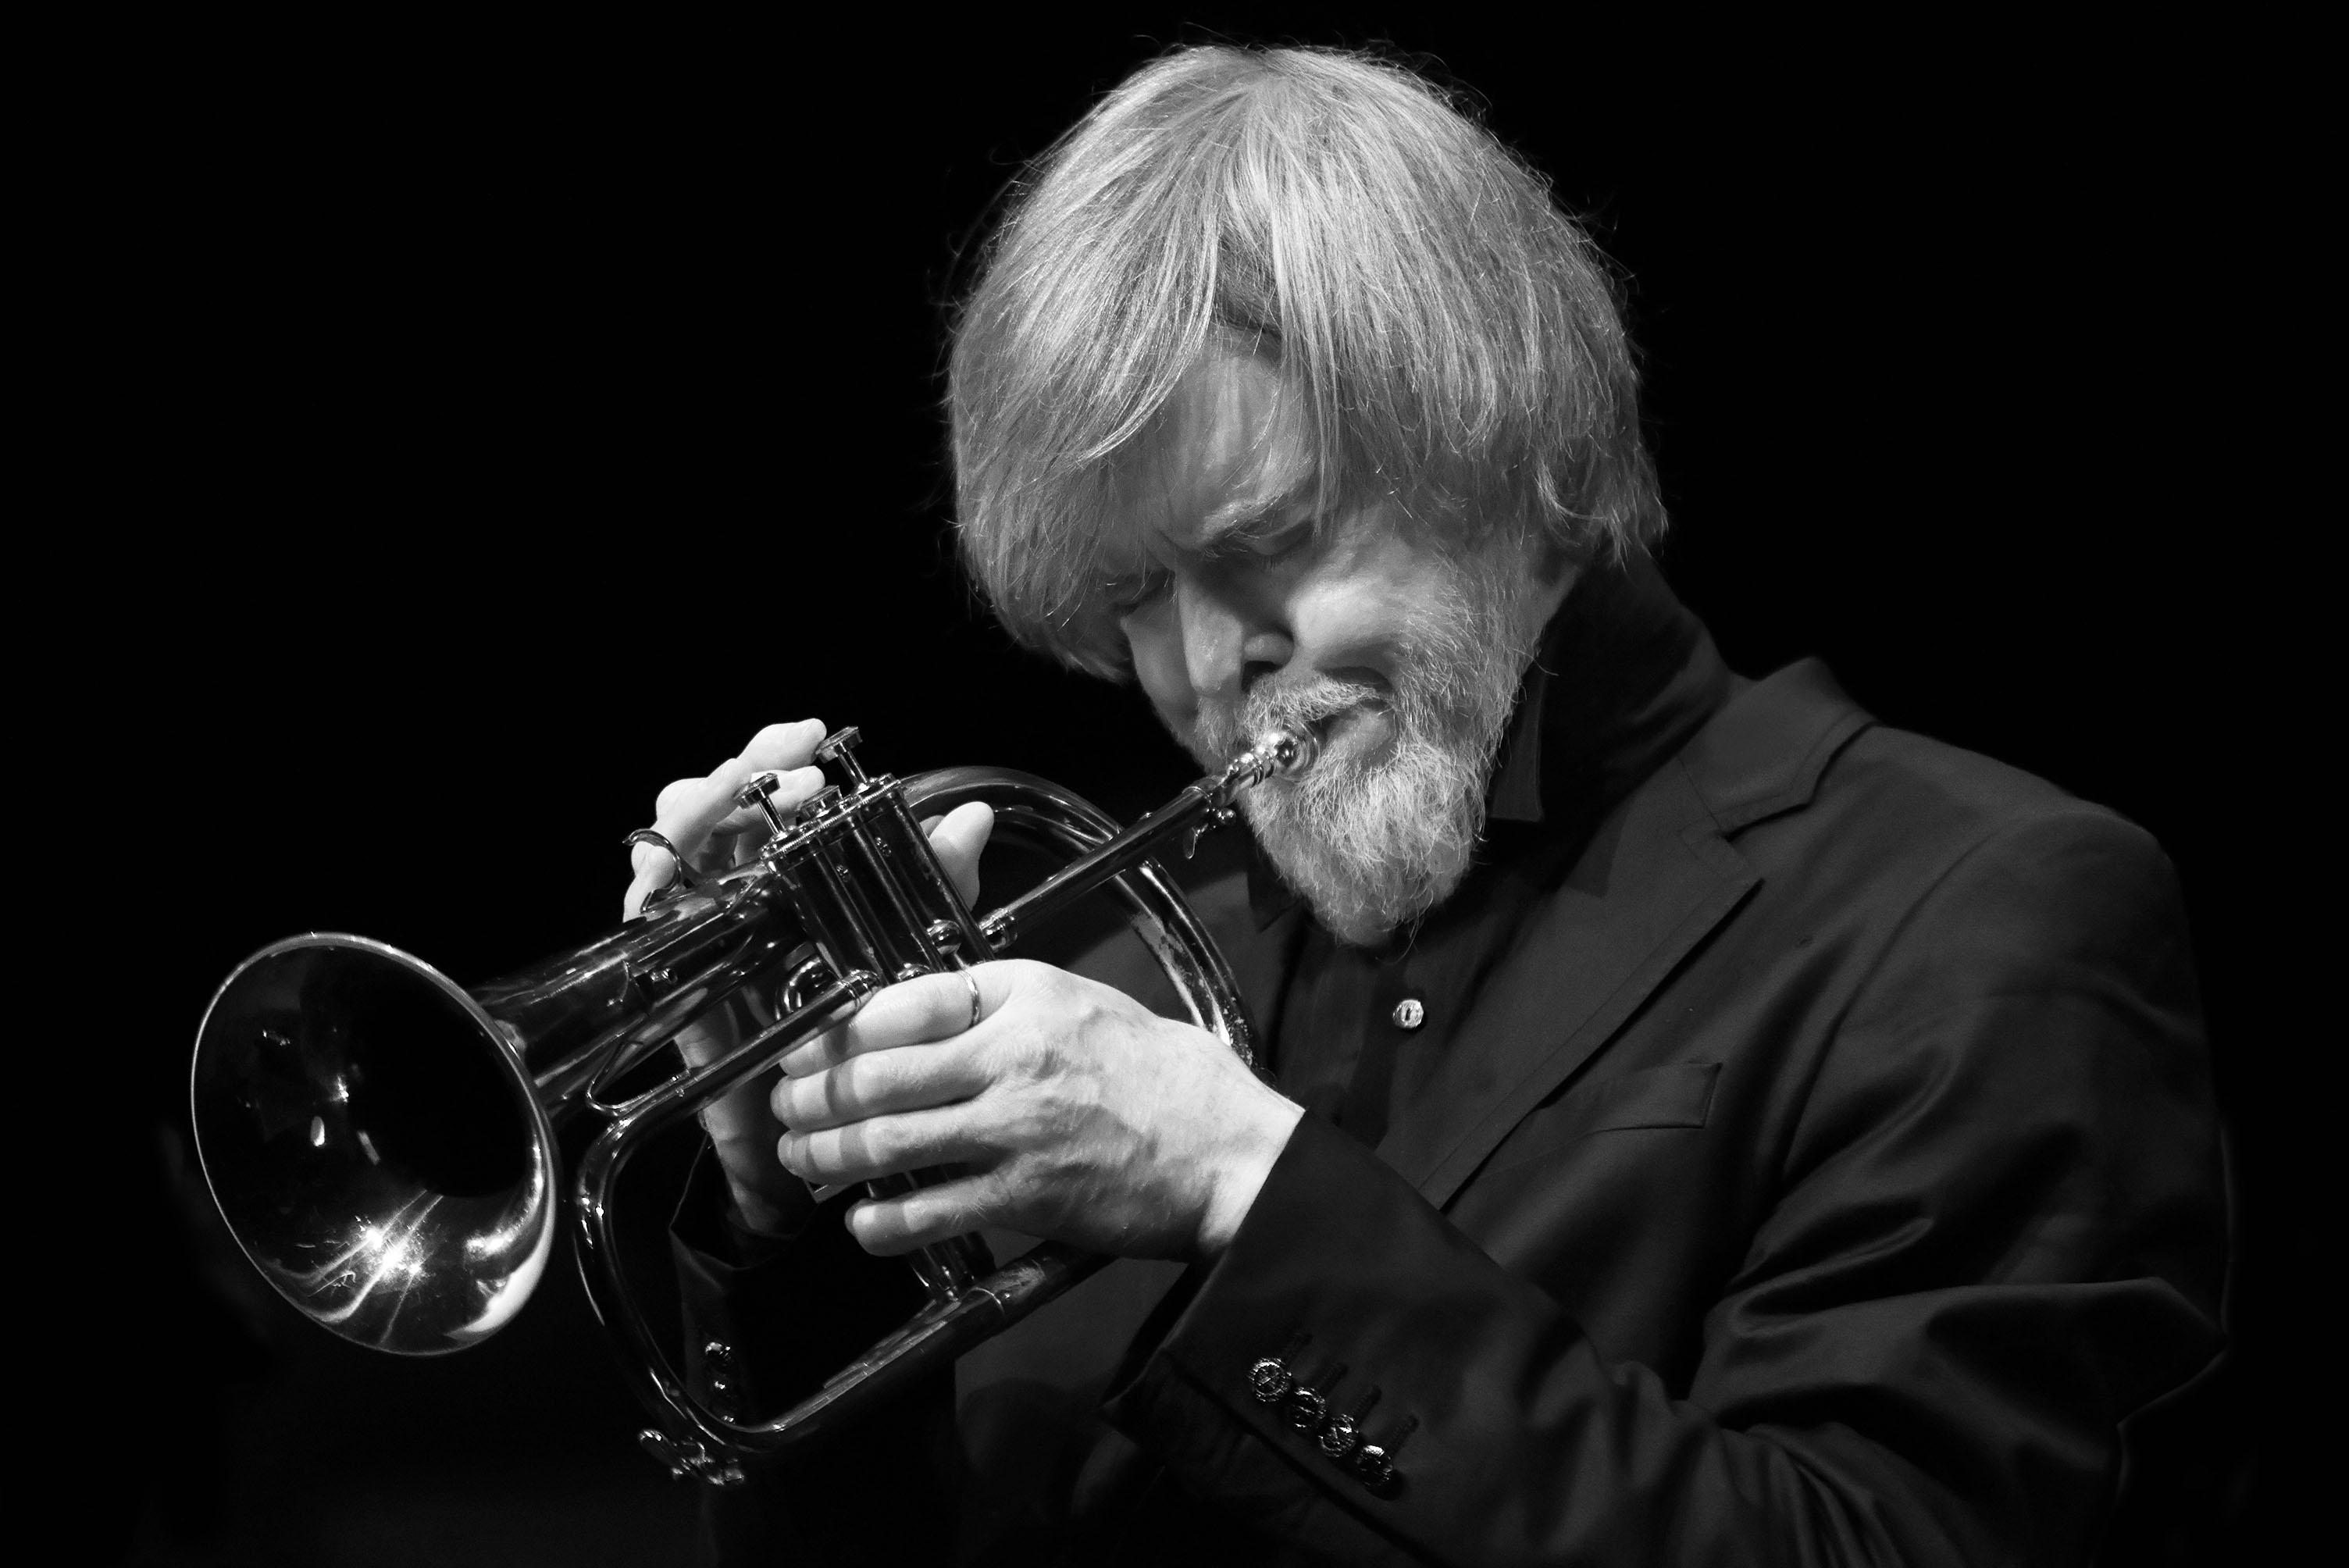 Tom harrell quintet with strings, 2013 td ottawa jazz festival